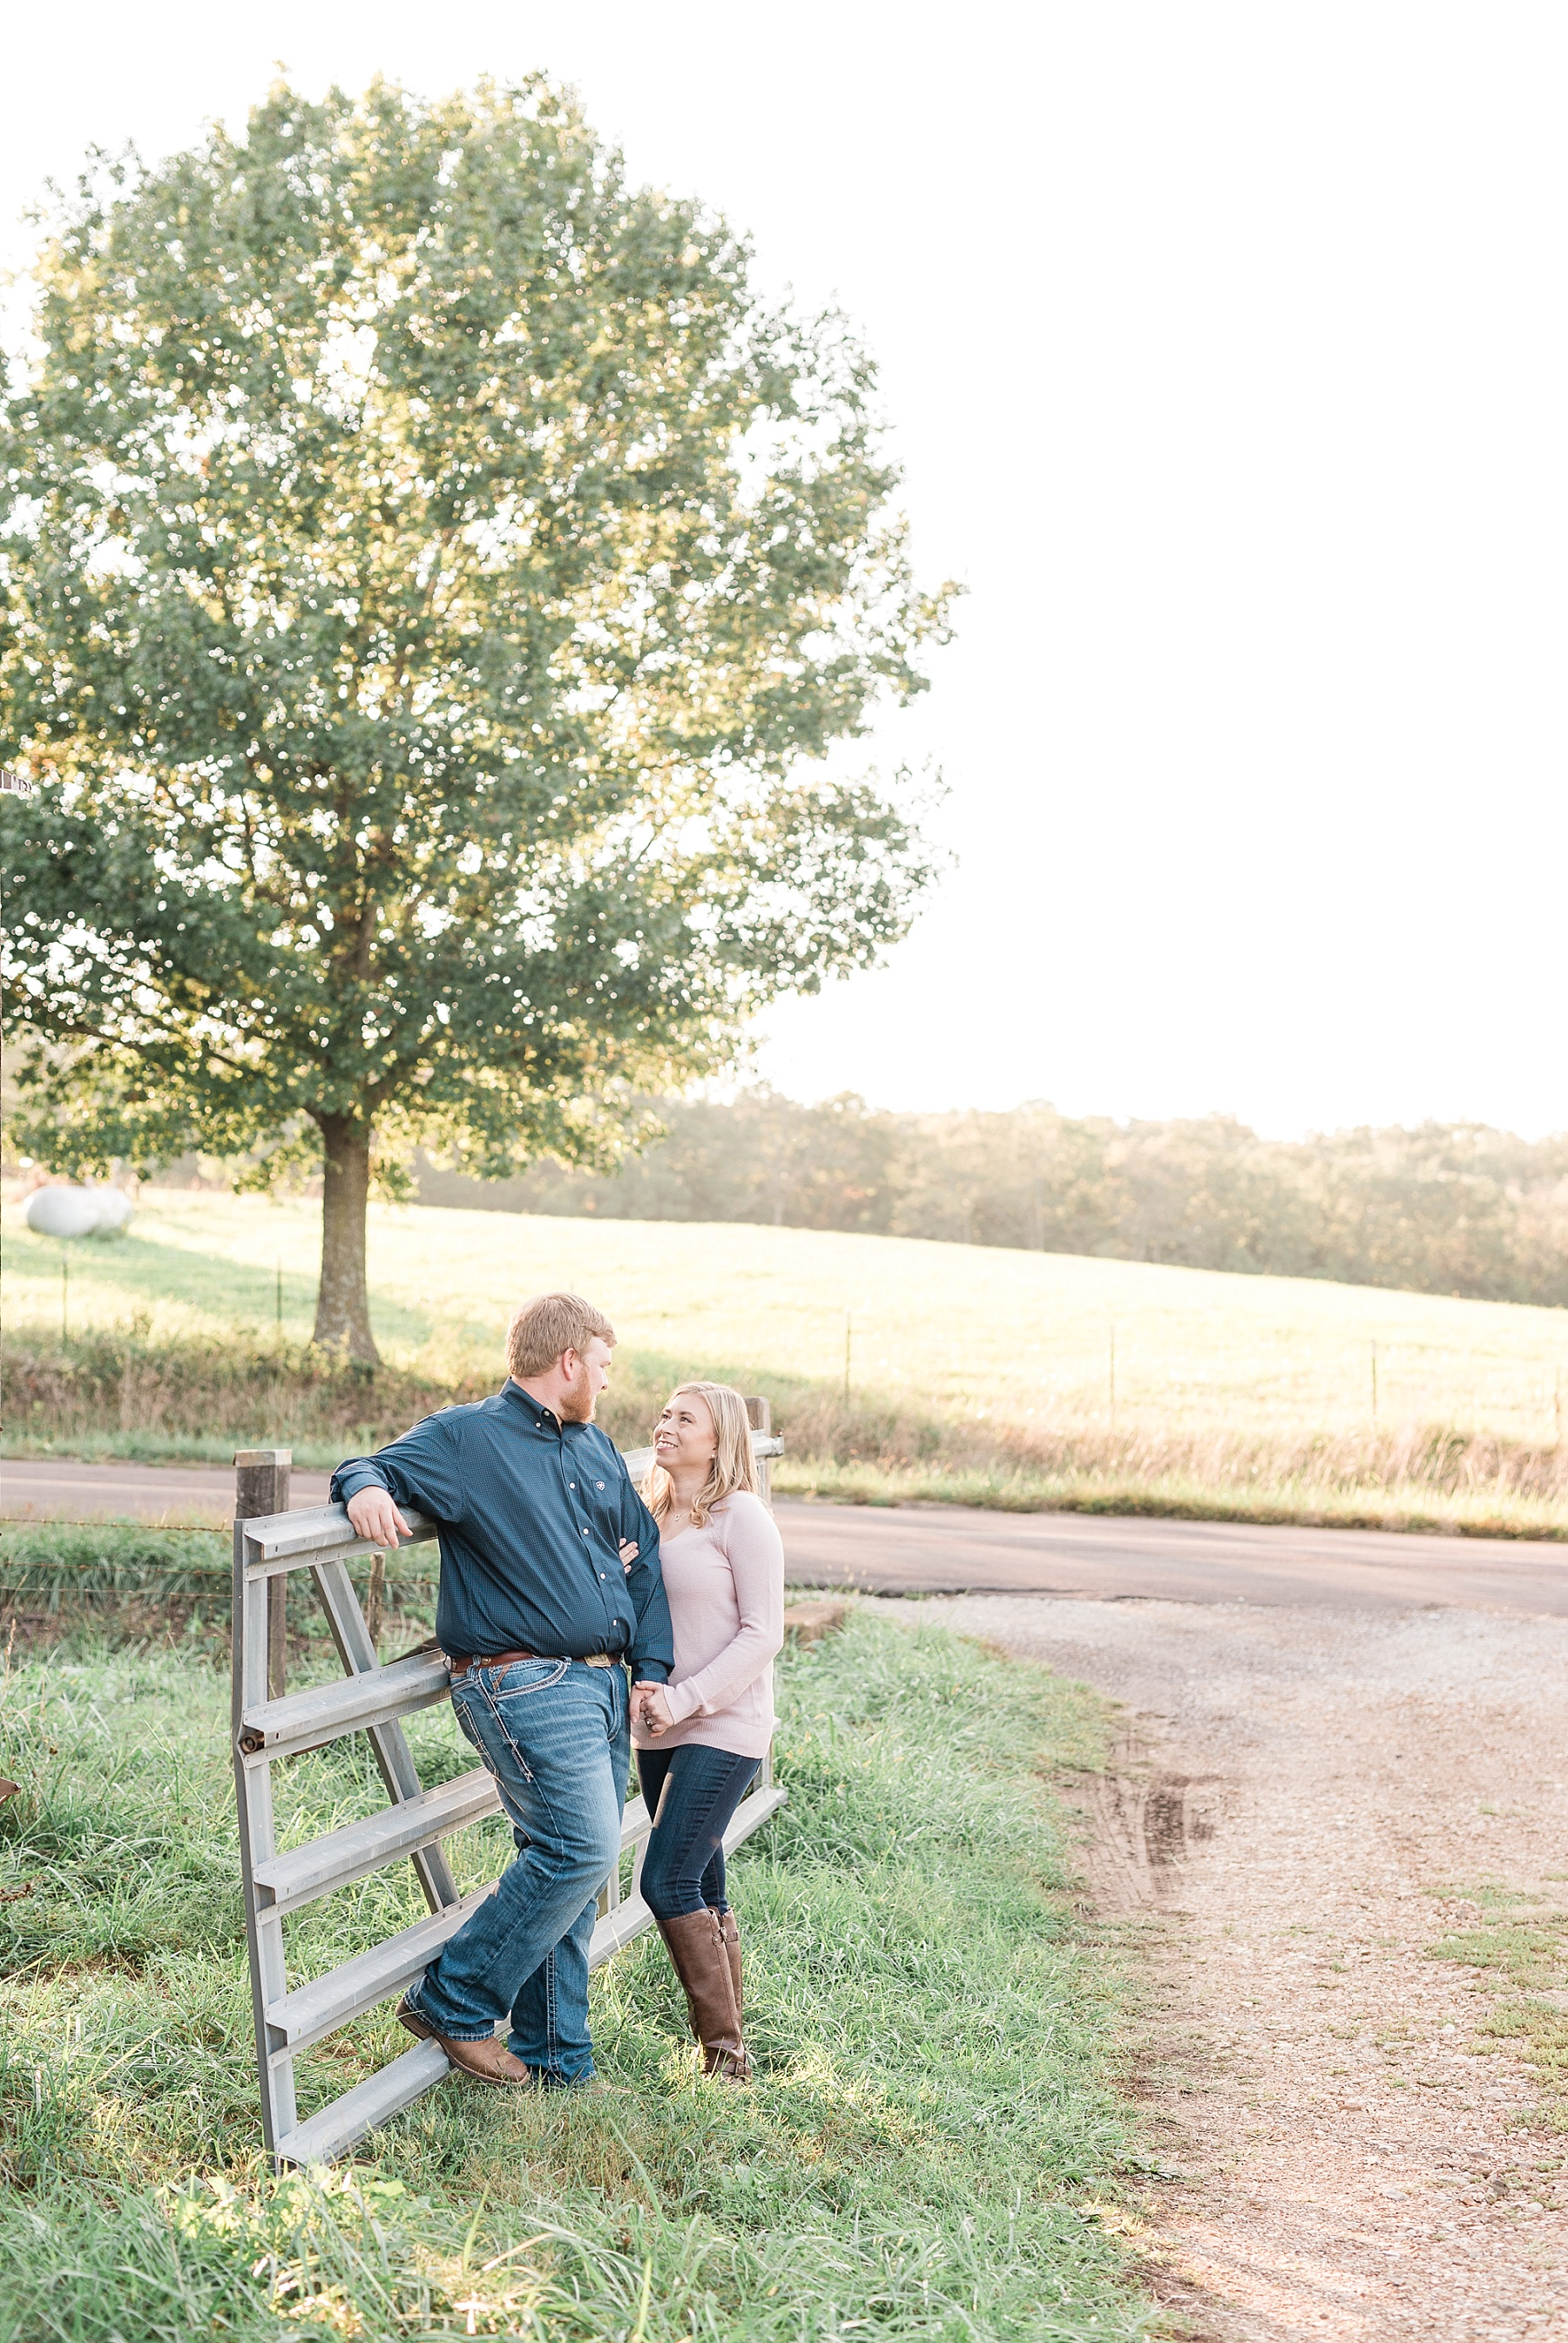 Autumn Golden Sunset Engagement Session on Farm in Missouri by Kelsi Kliethermes Photography_0007.jpg